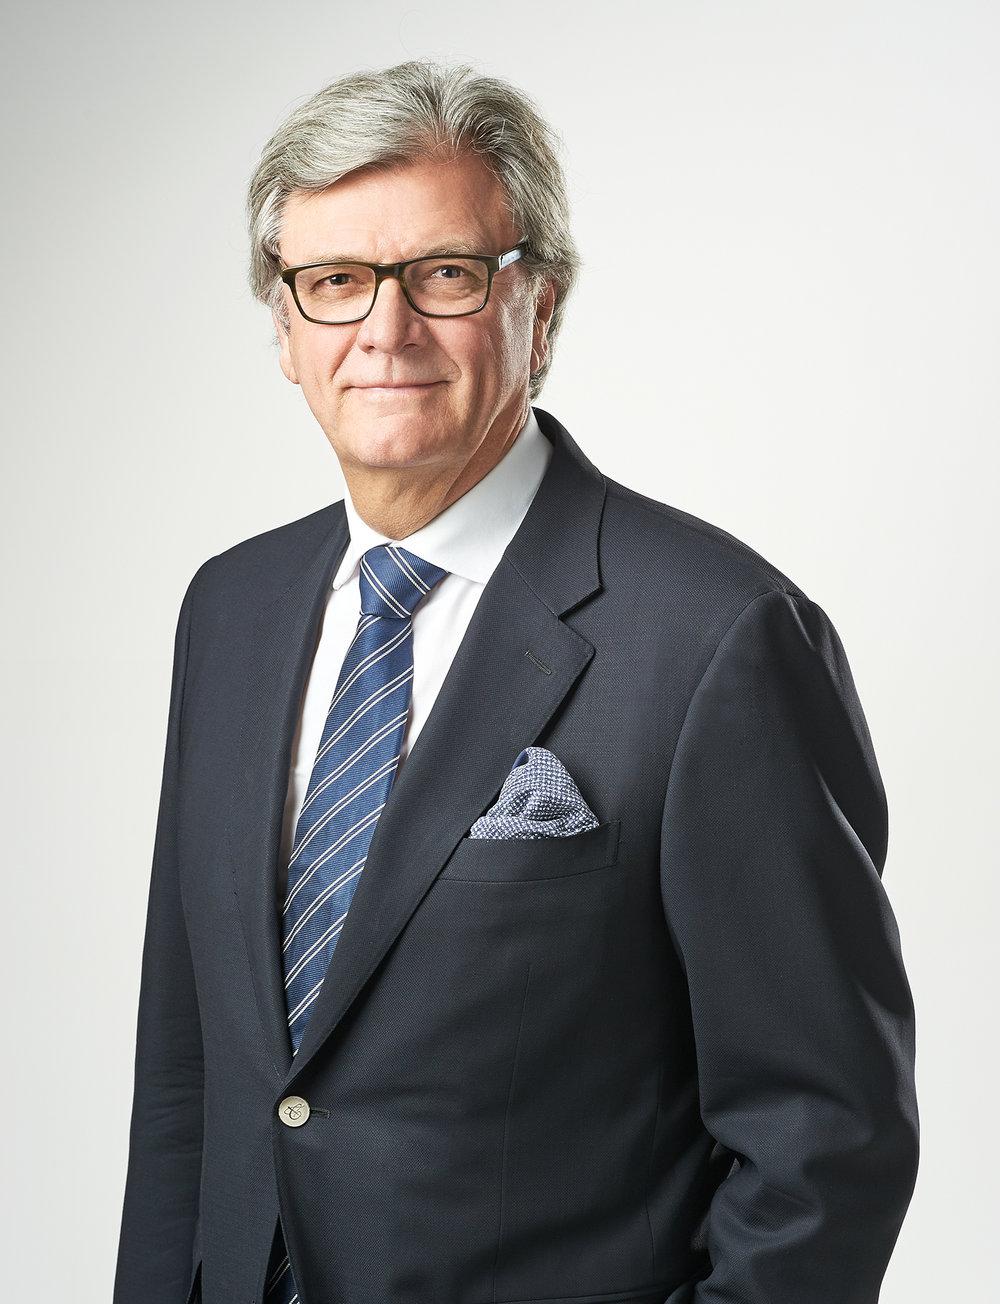 Dr Michael Hammerton - MBBS, FRACS, FRANZCO